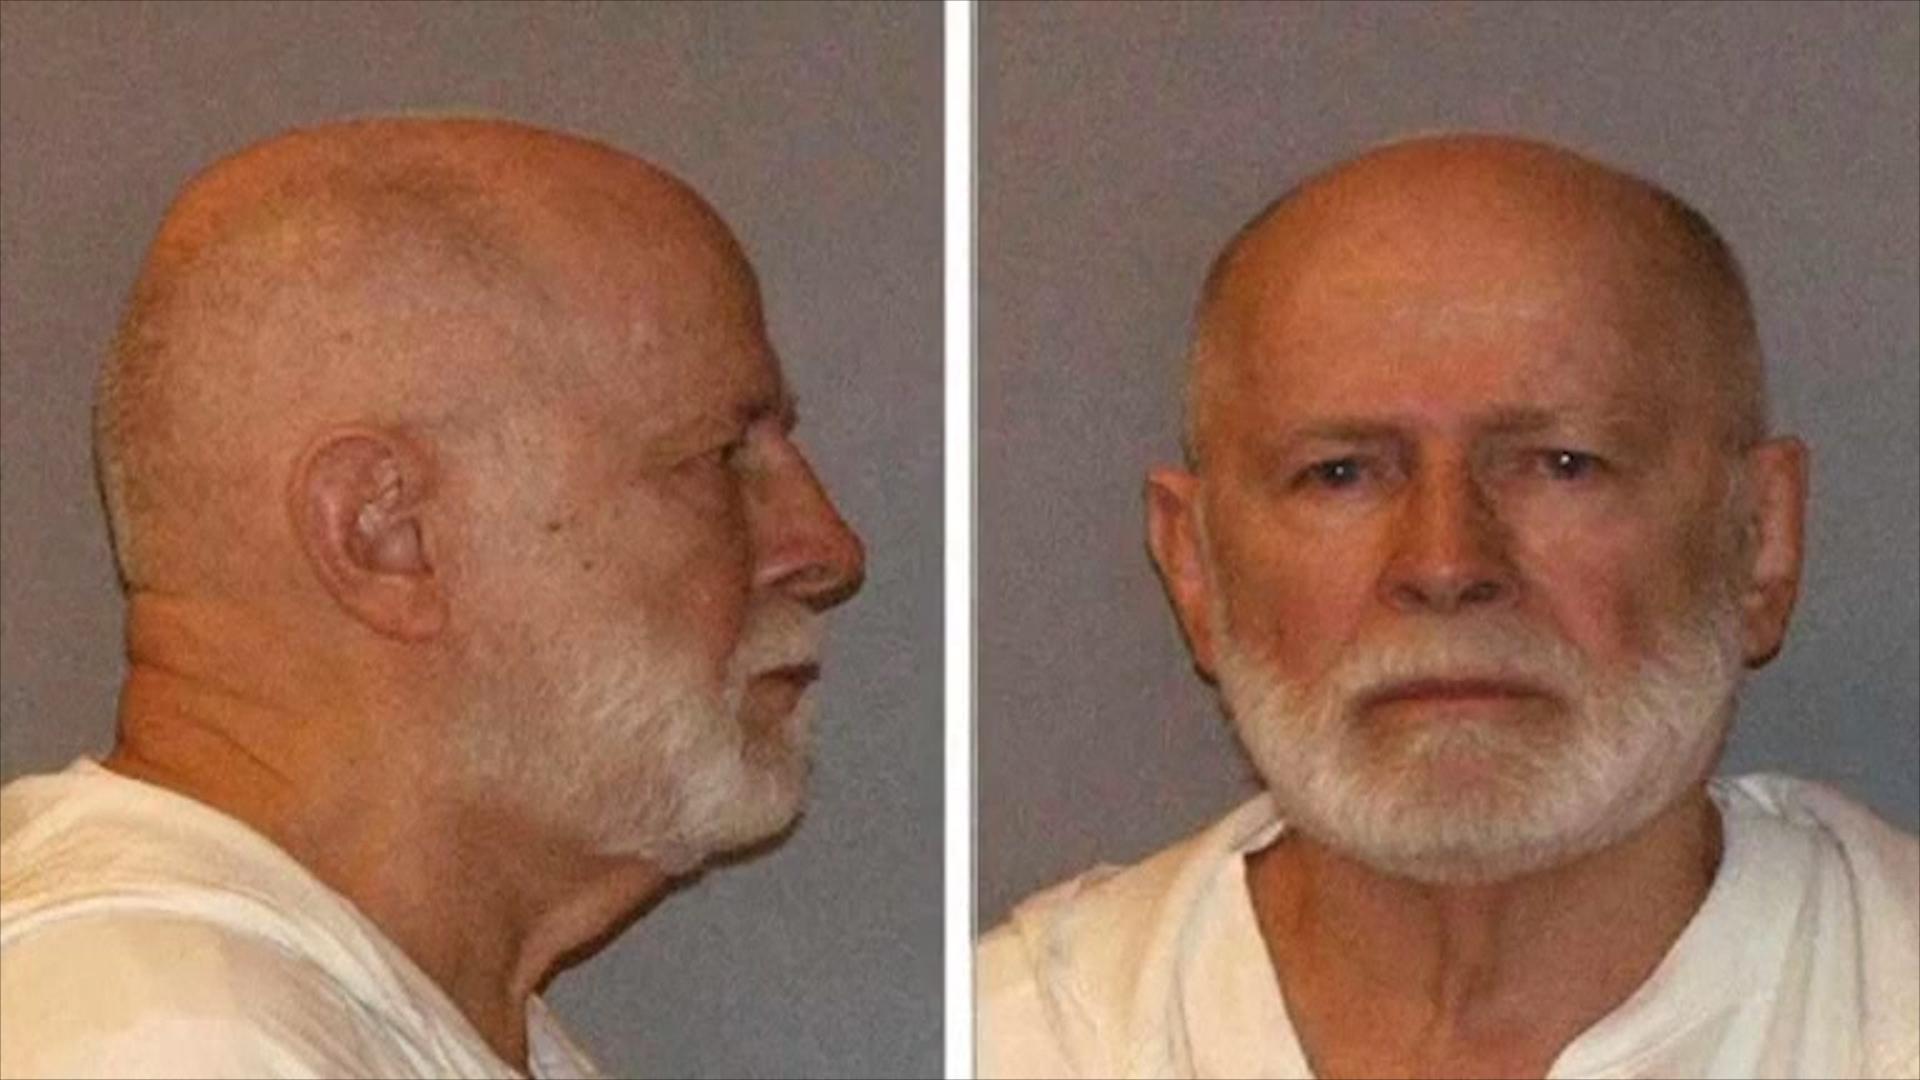 Whitey Bulger, Boston crime boss and elusive fugitive, dead in prison at 89